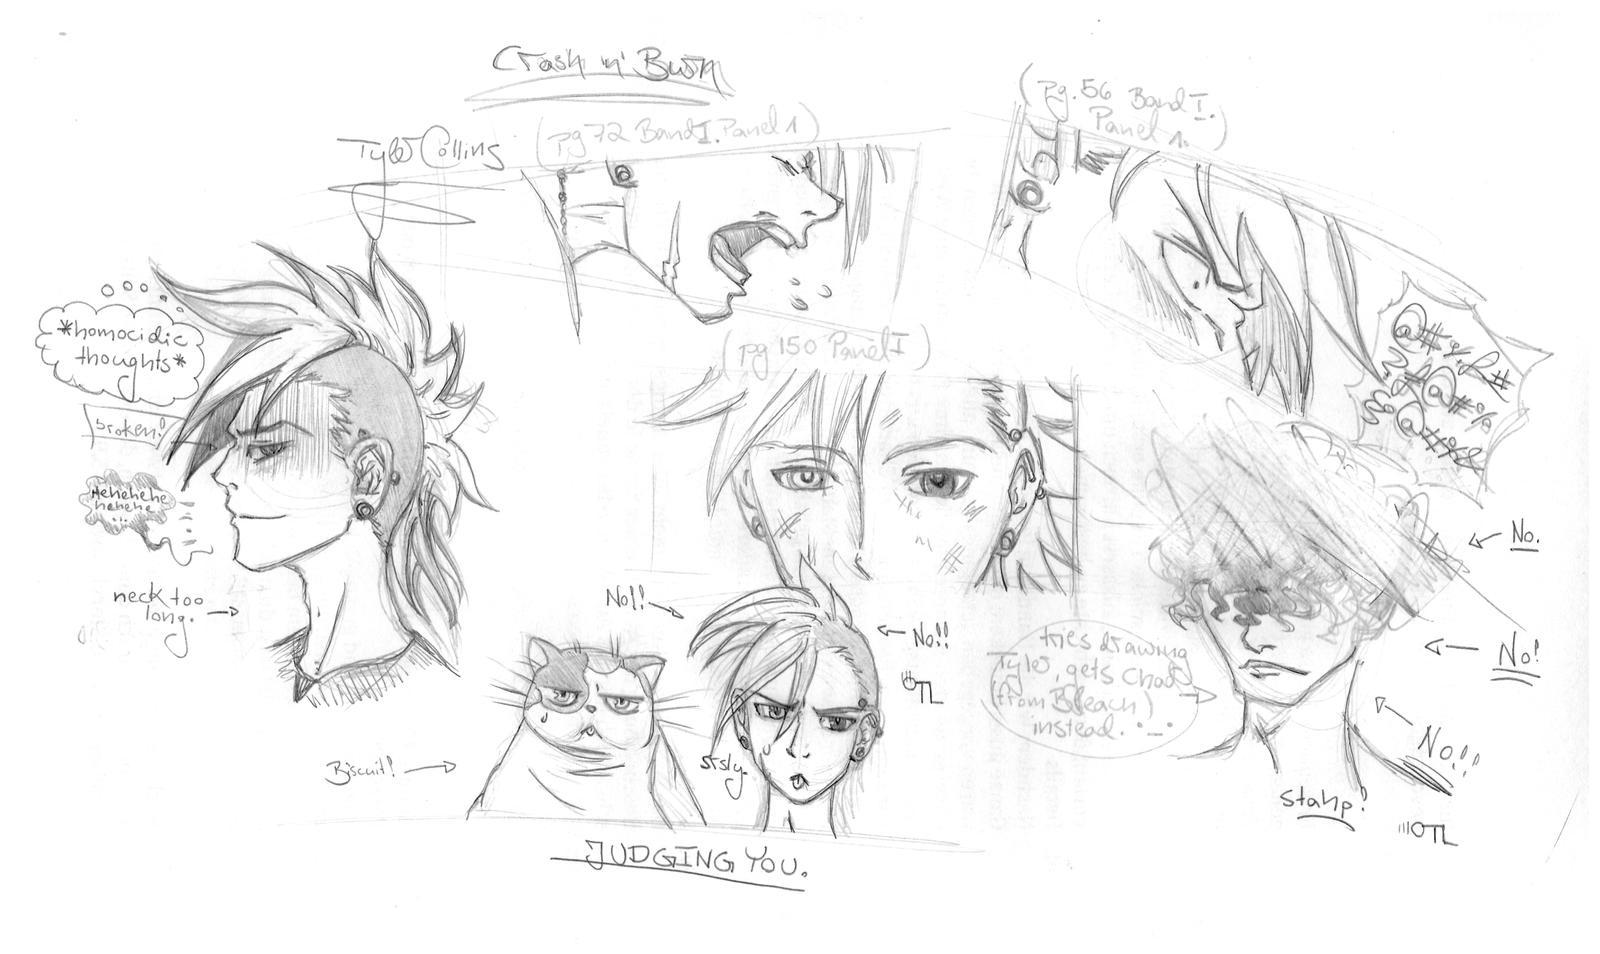 Crash 'n' Burn Fan Doodles by VegemiteGuzzler